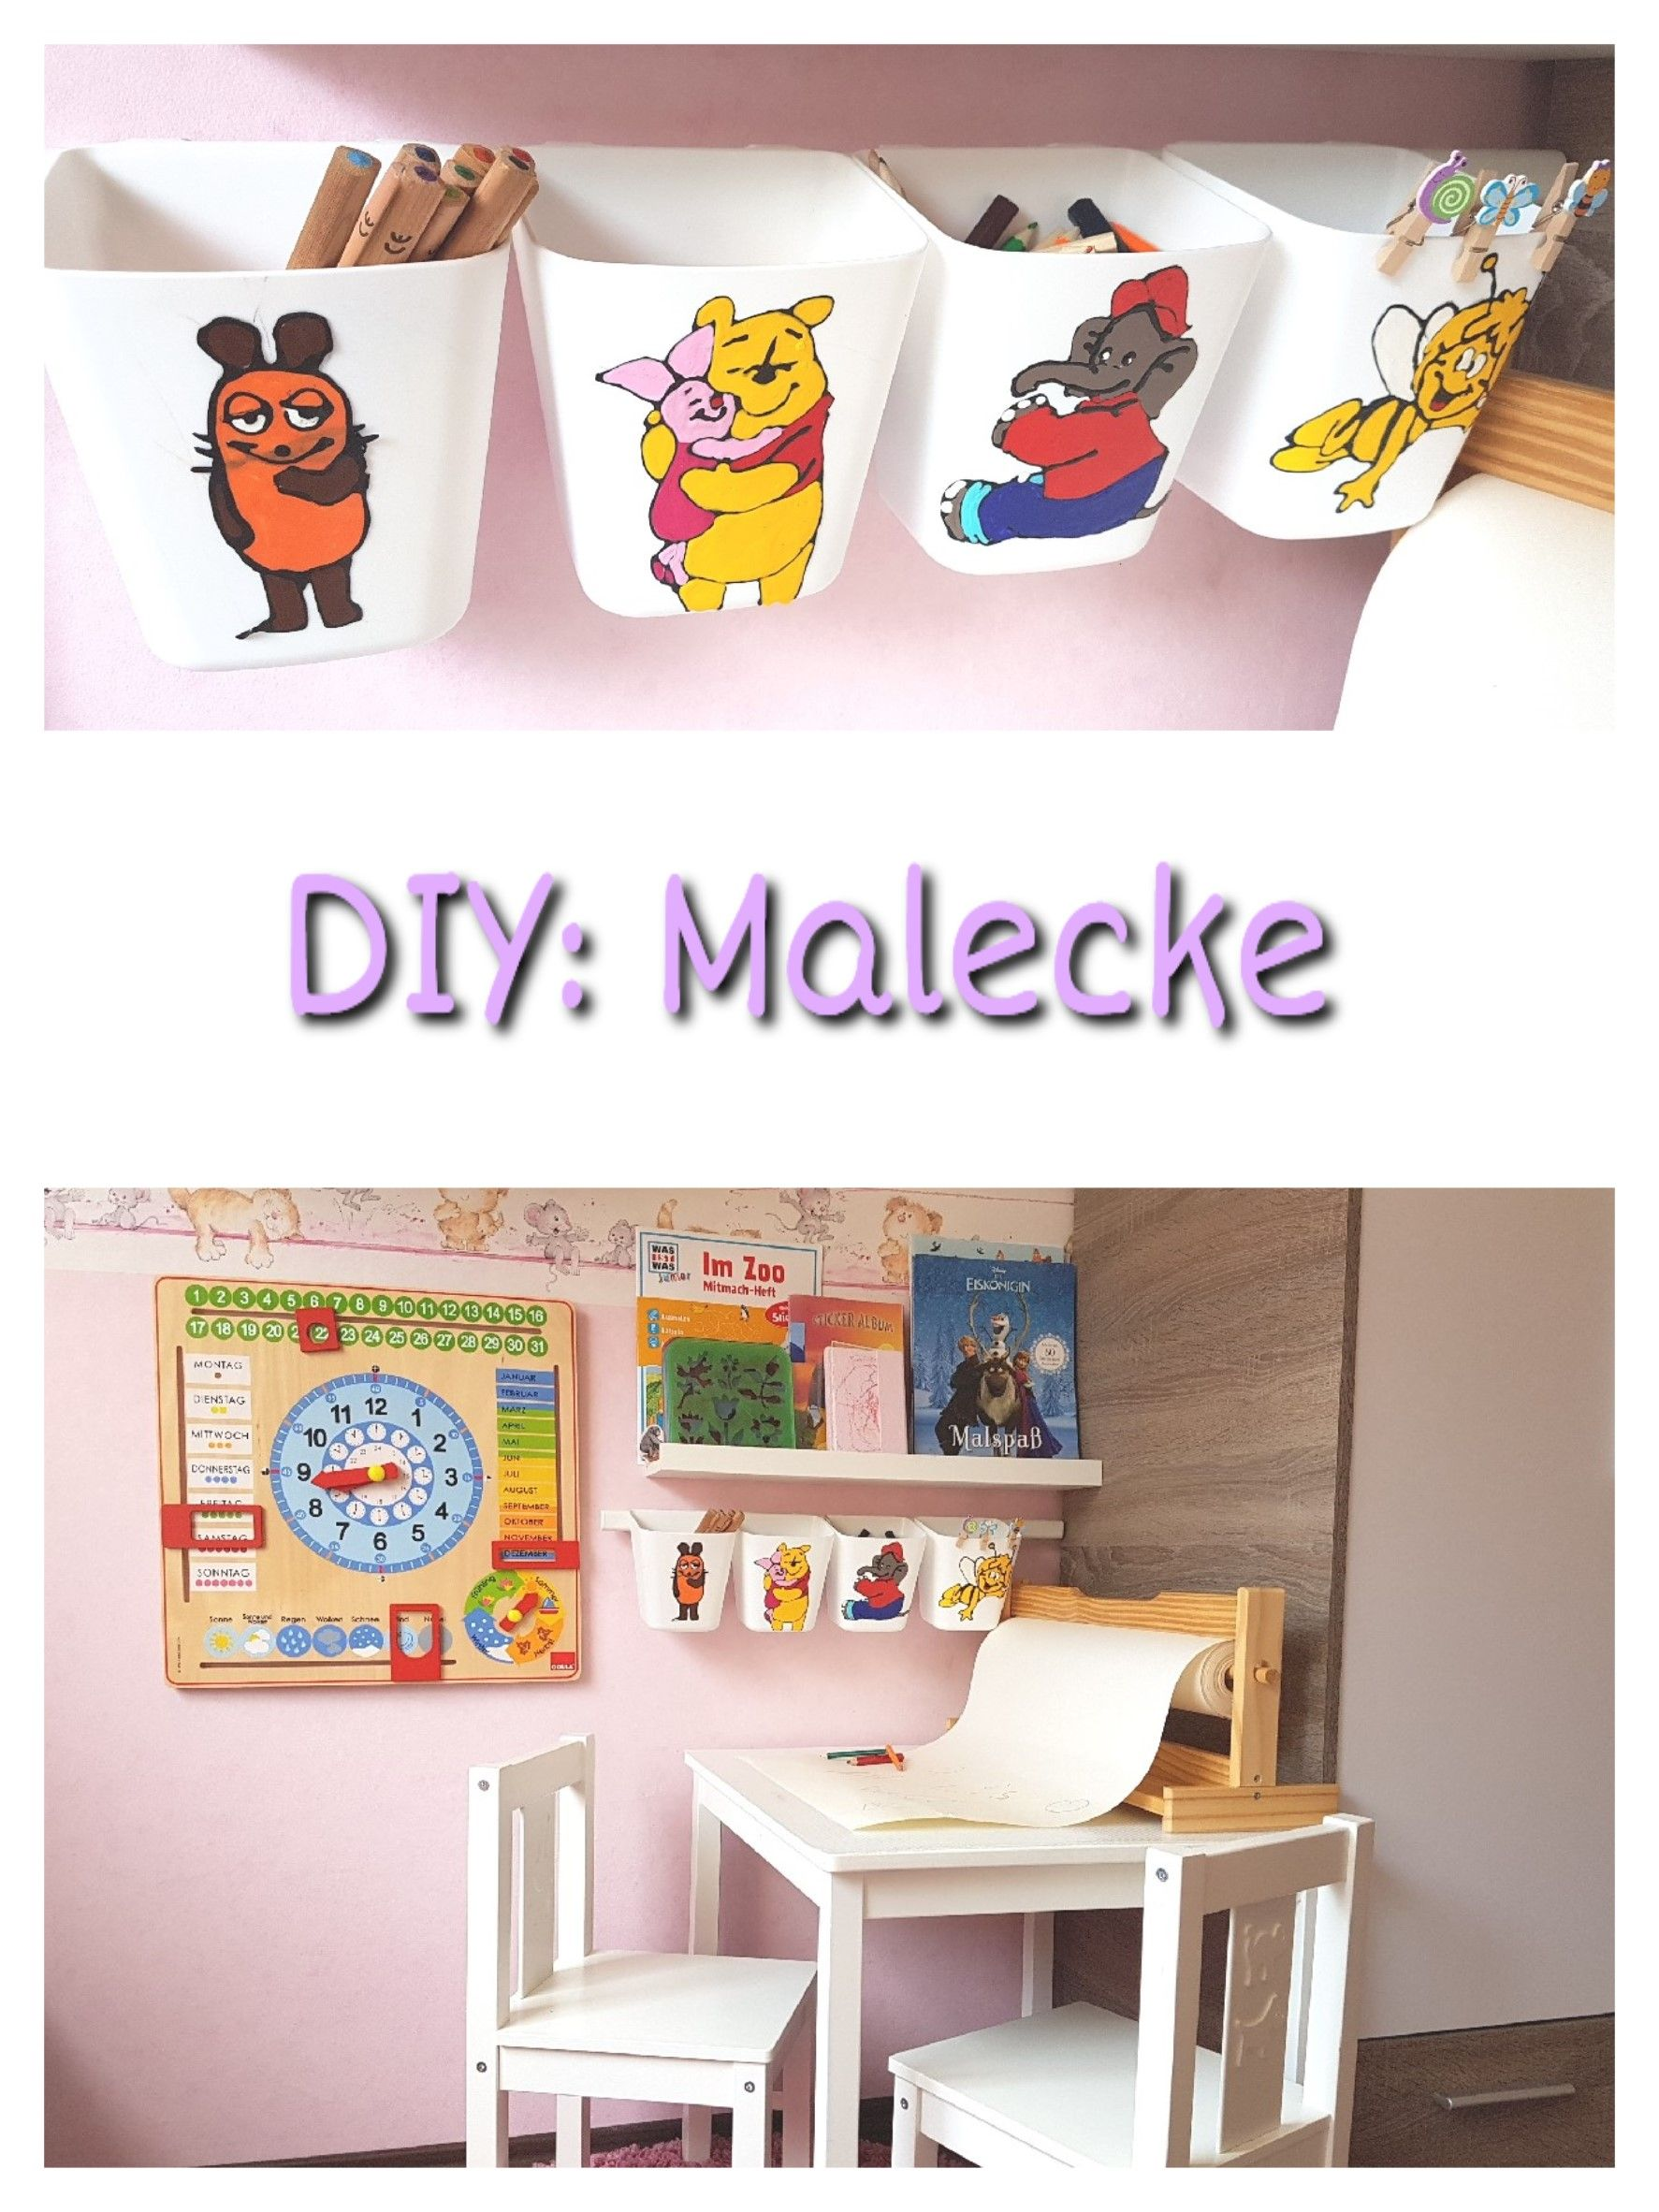 DIY, Selber Machen, Malecke, Kinderzimmer, Familie, Ikea, Kreativ